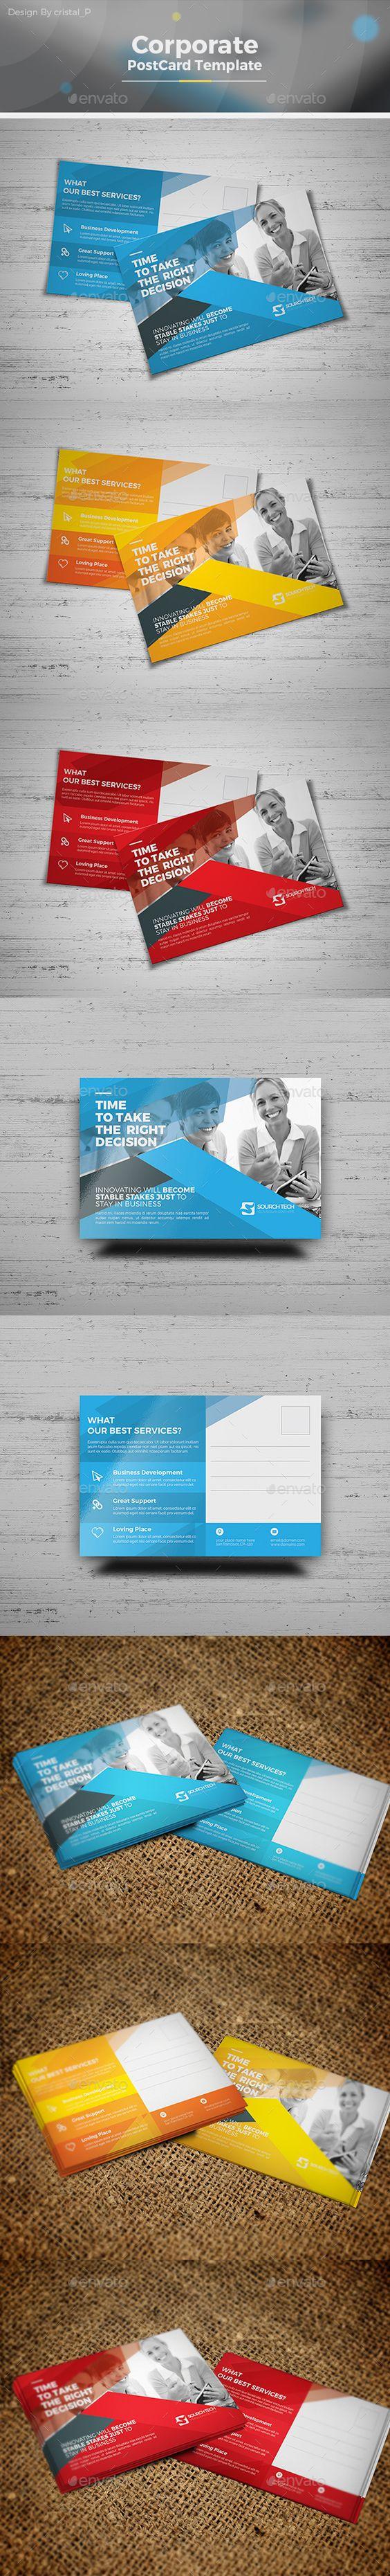 Postcard Template | Illustrators, Ai illustrator and Postcard template